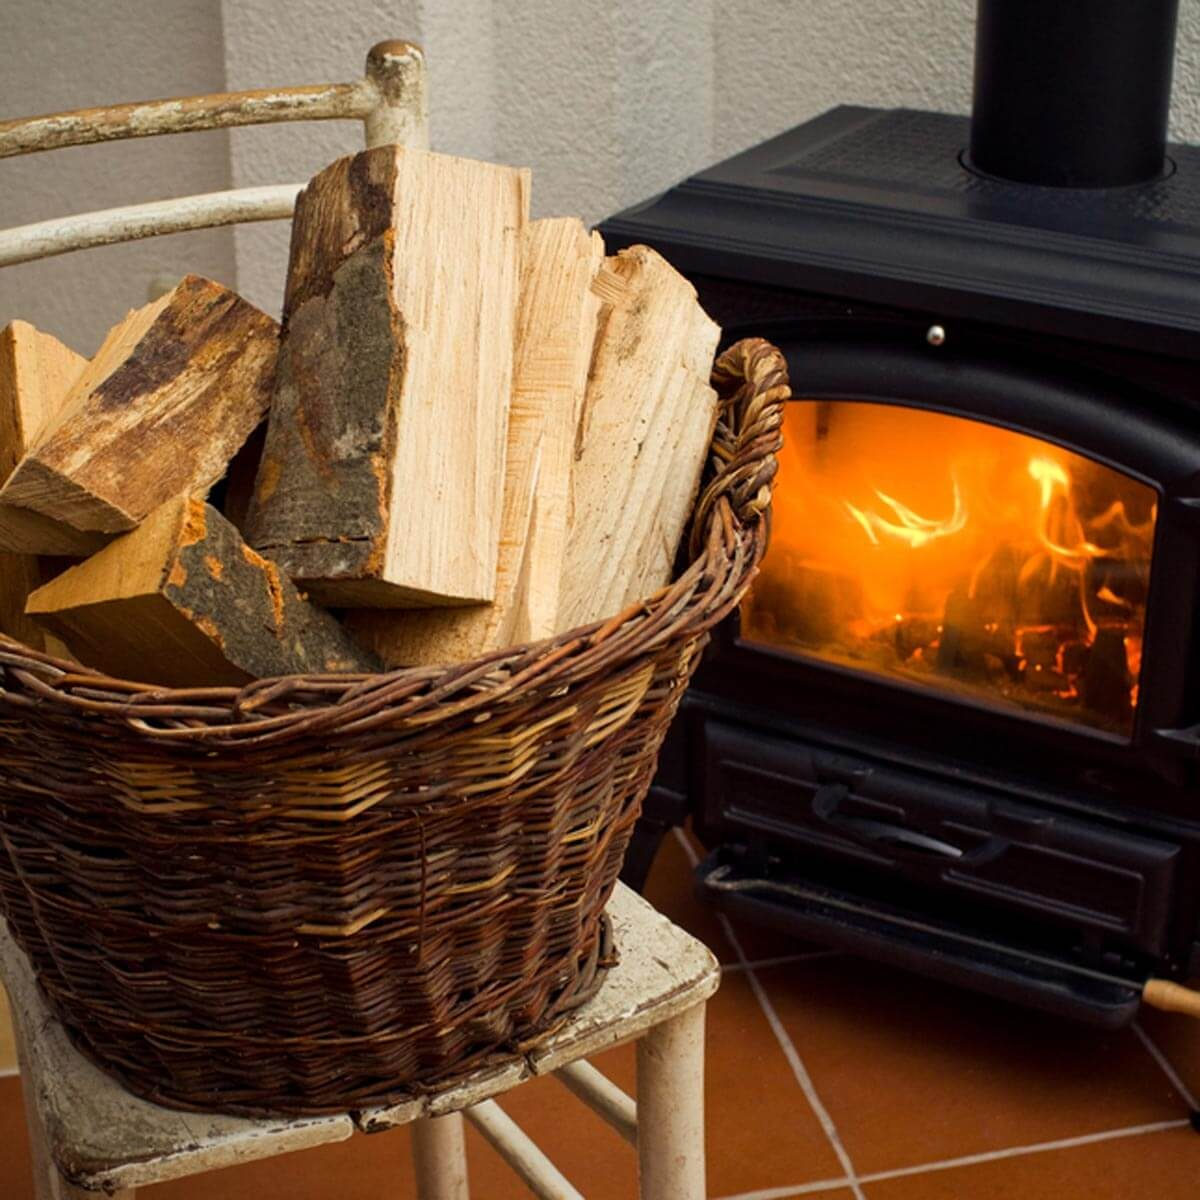 Plan an Alternate Method of Heating